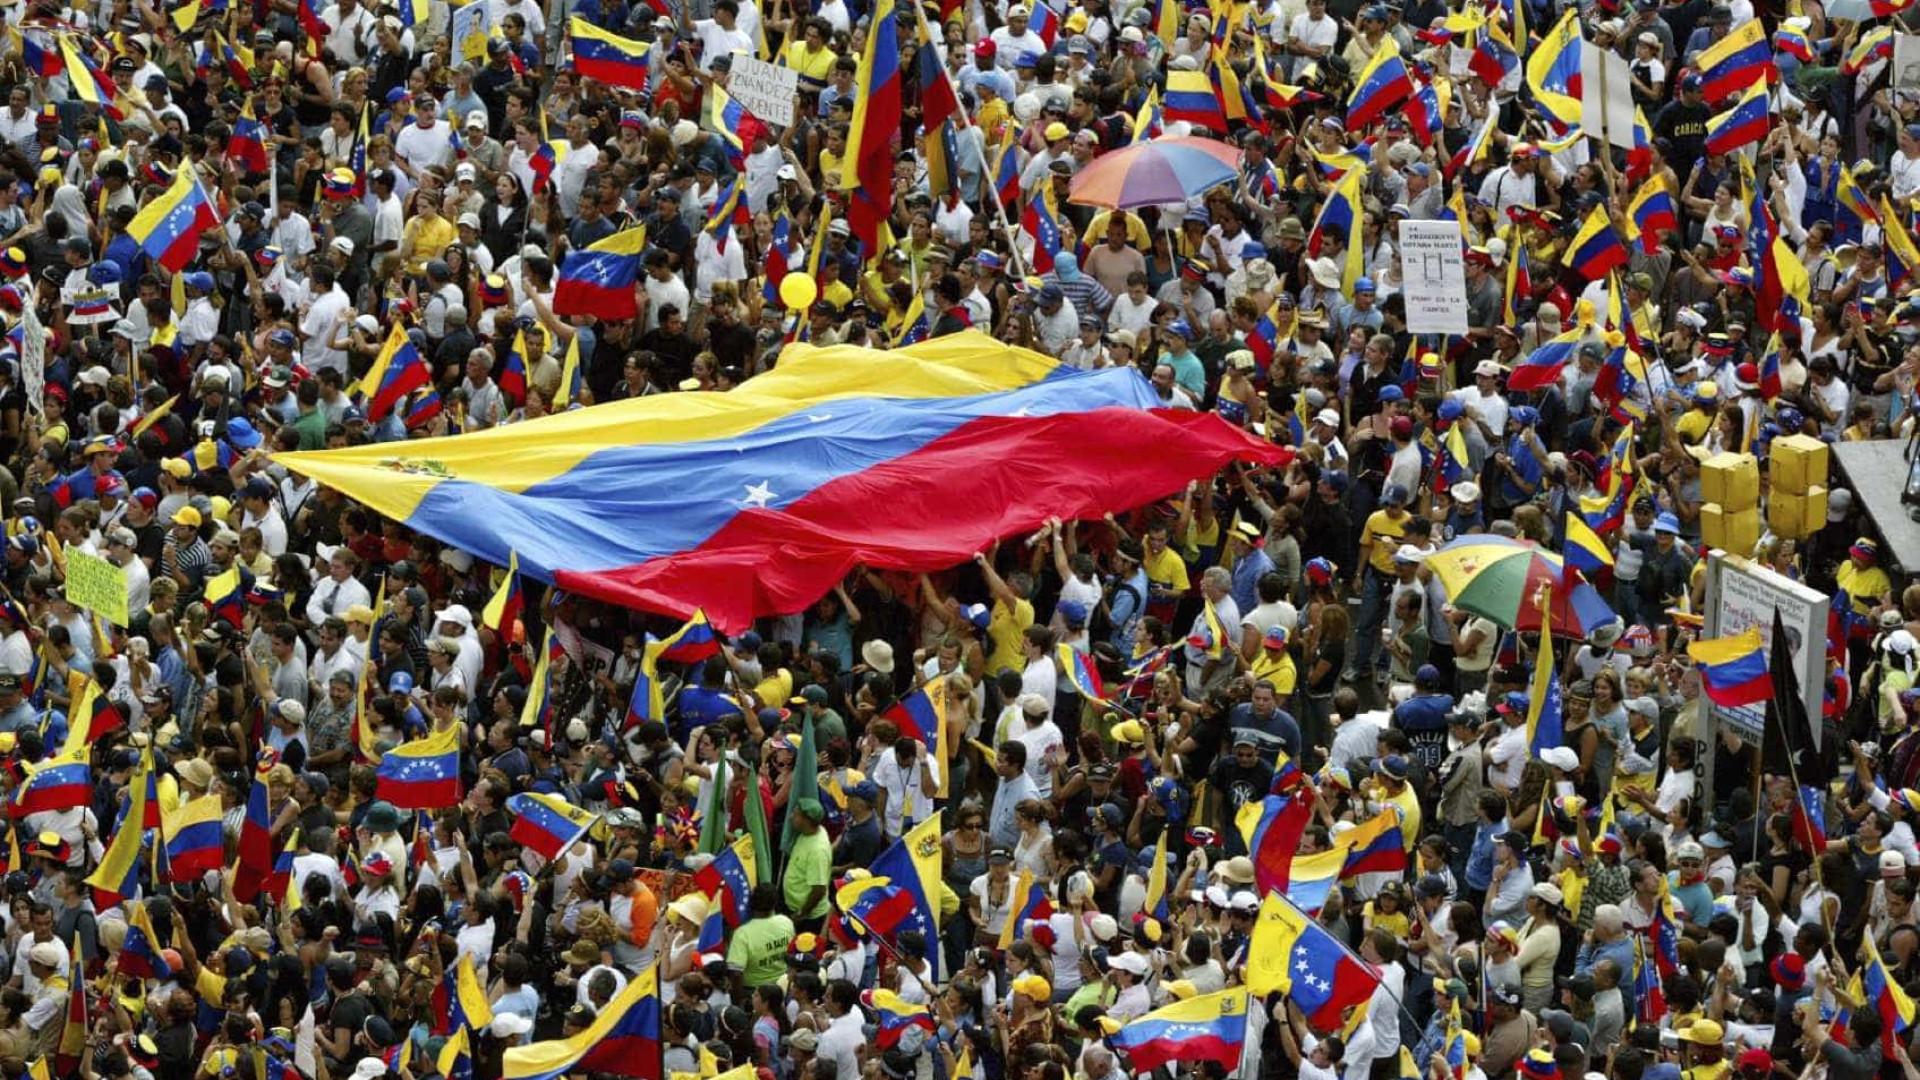 Venezuela detectou 54 aeronaves norte-americanas nos últimos 30 dias